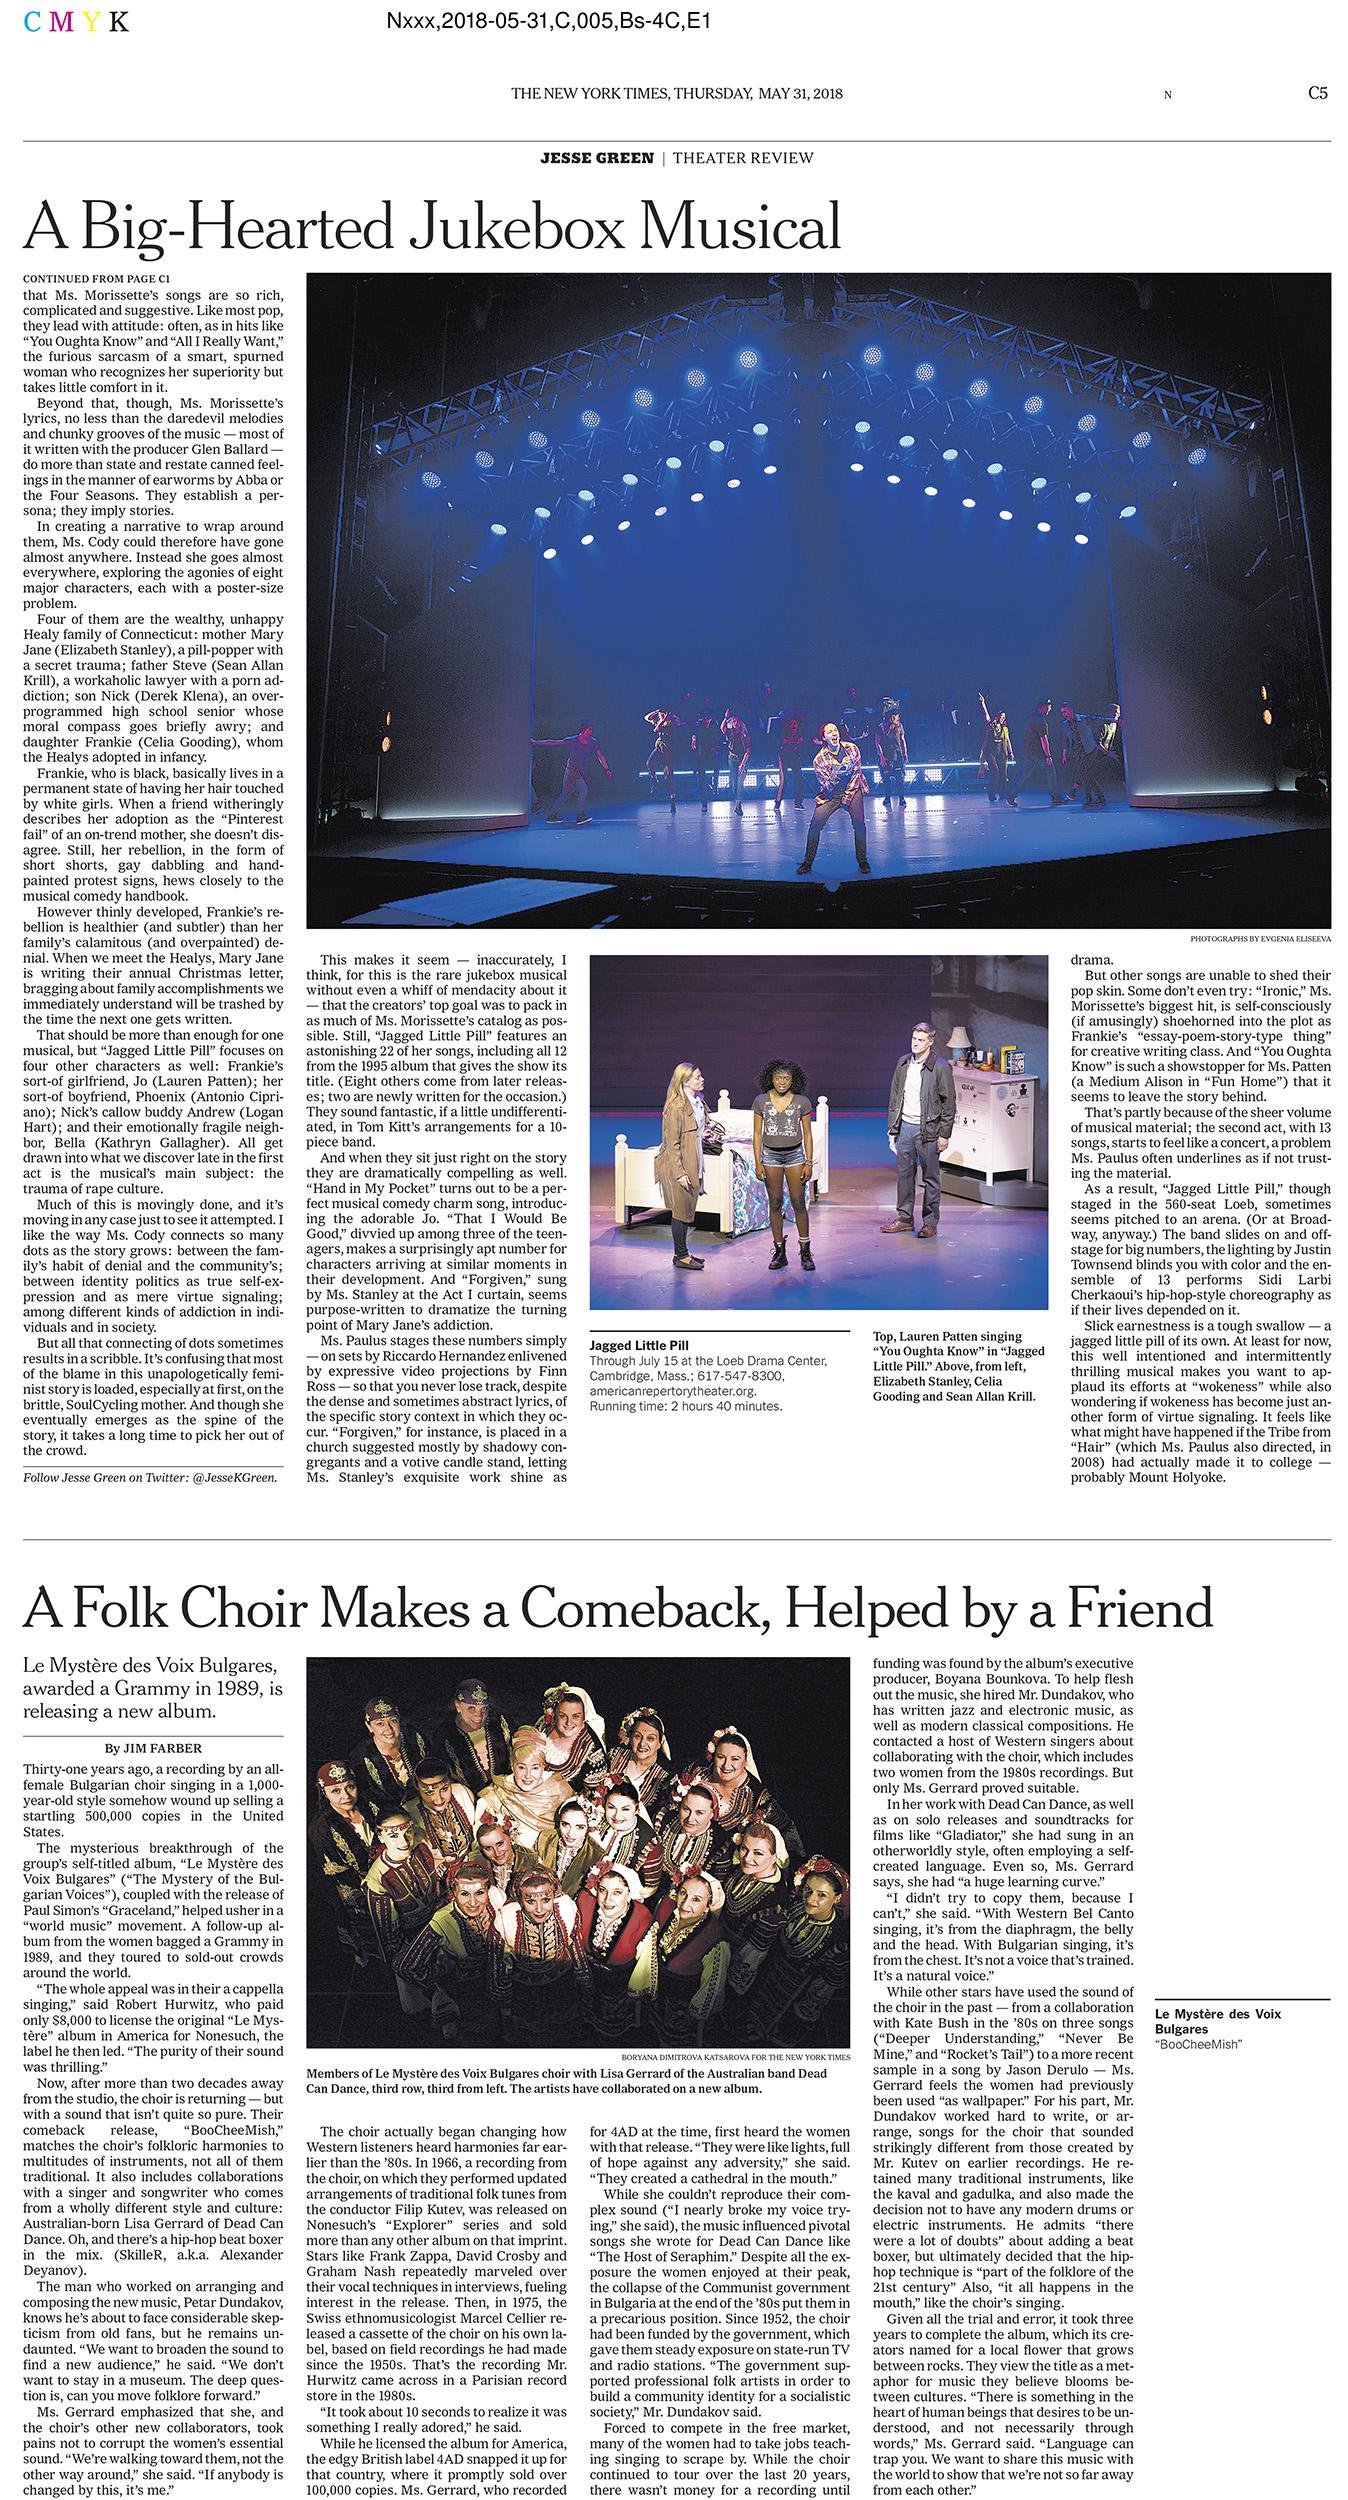 NYT#NYTimes#05-31-2018#NewYork#1#CulInside4#1#cci